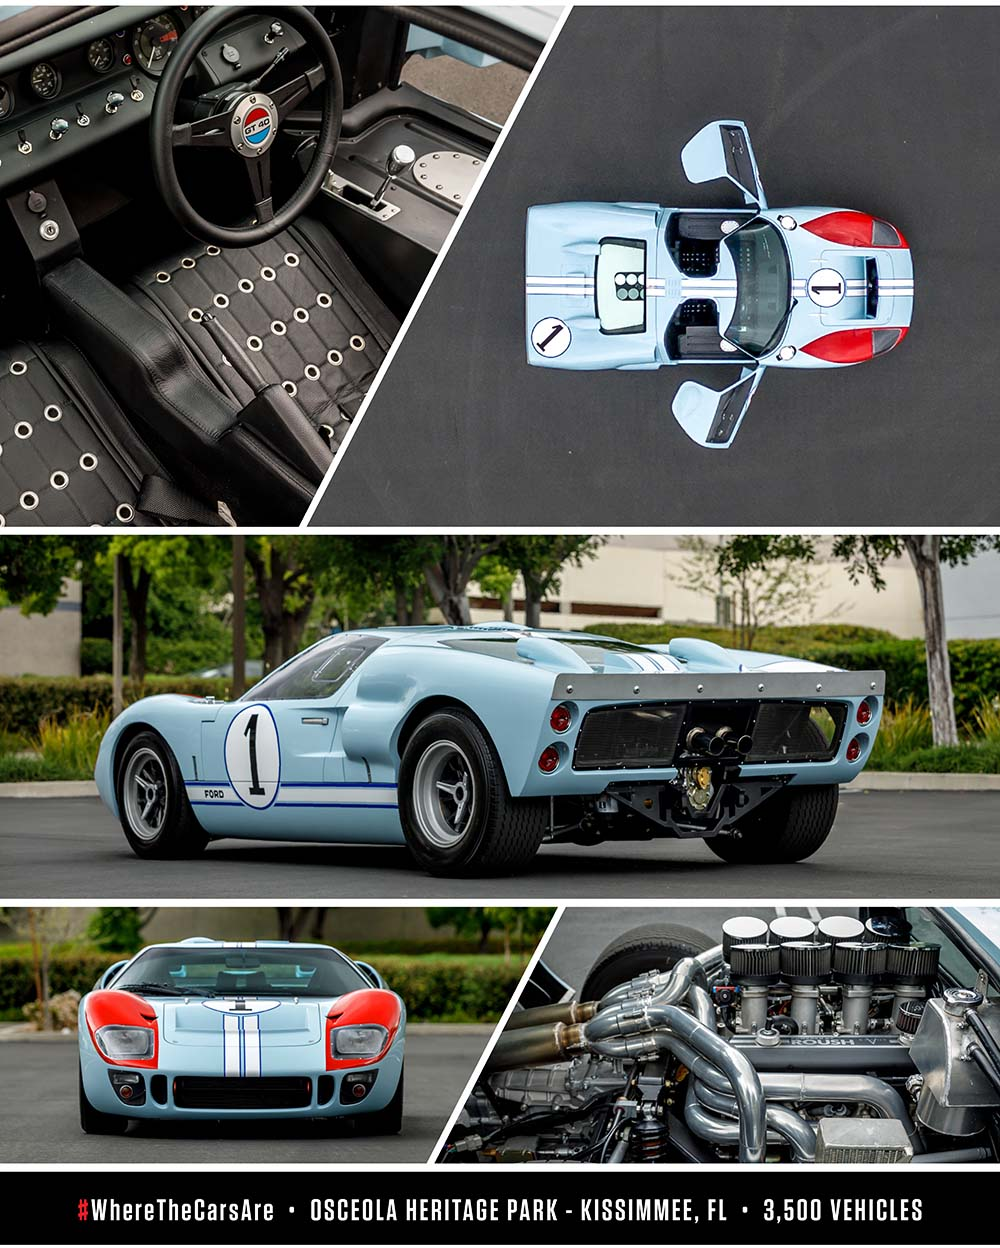 Mecum Kissimmee 2020 : Des Ford célèbres en vedette !  Edec3910-8f88-4998-9978-bb896dd542ed